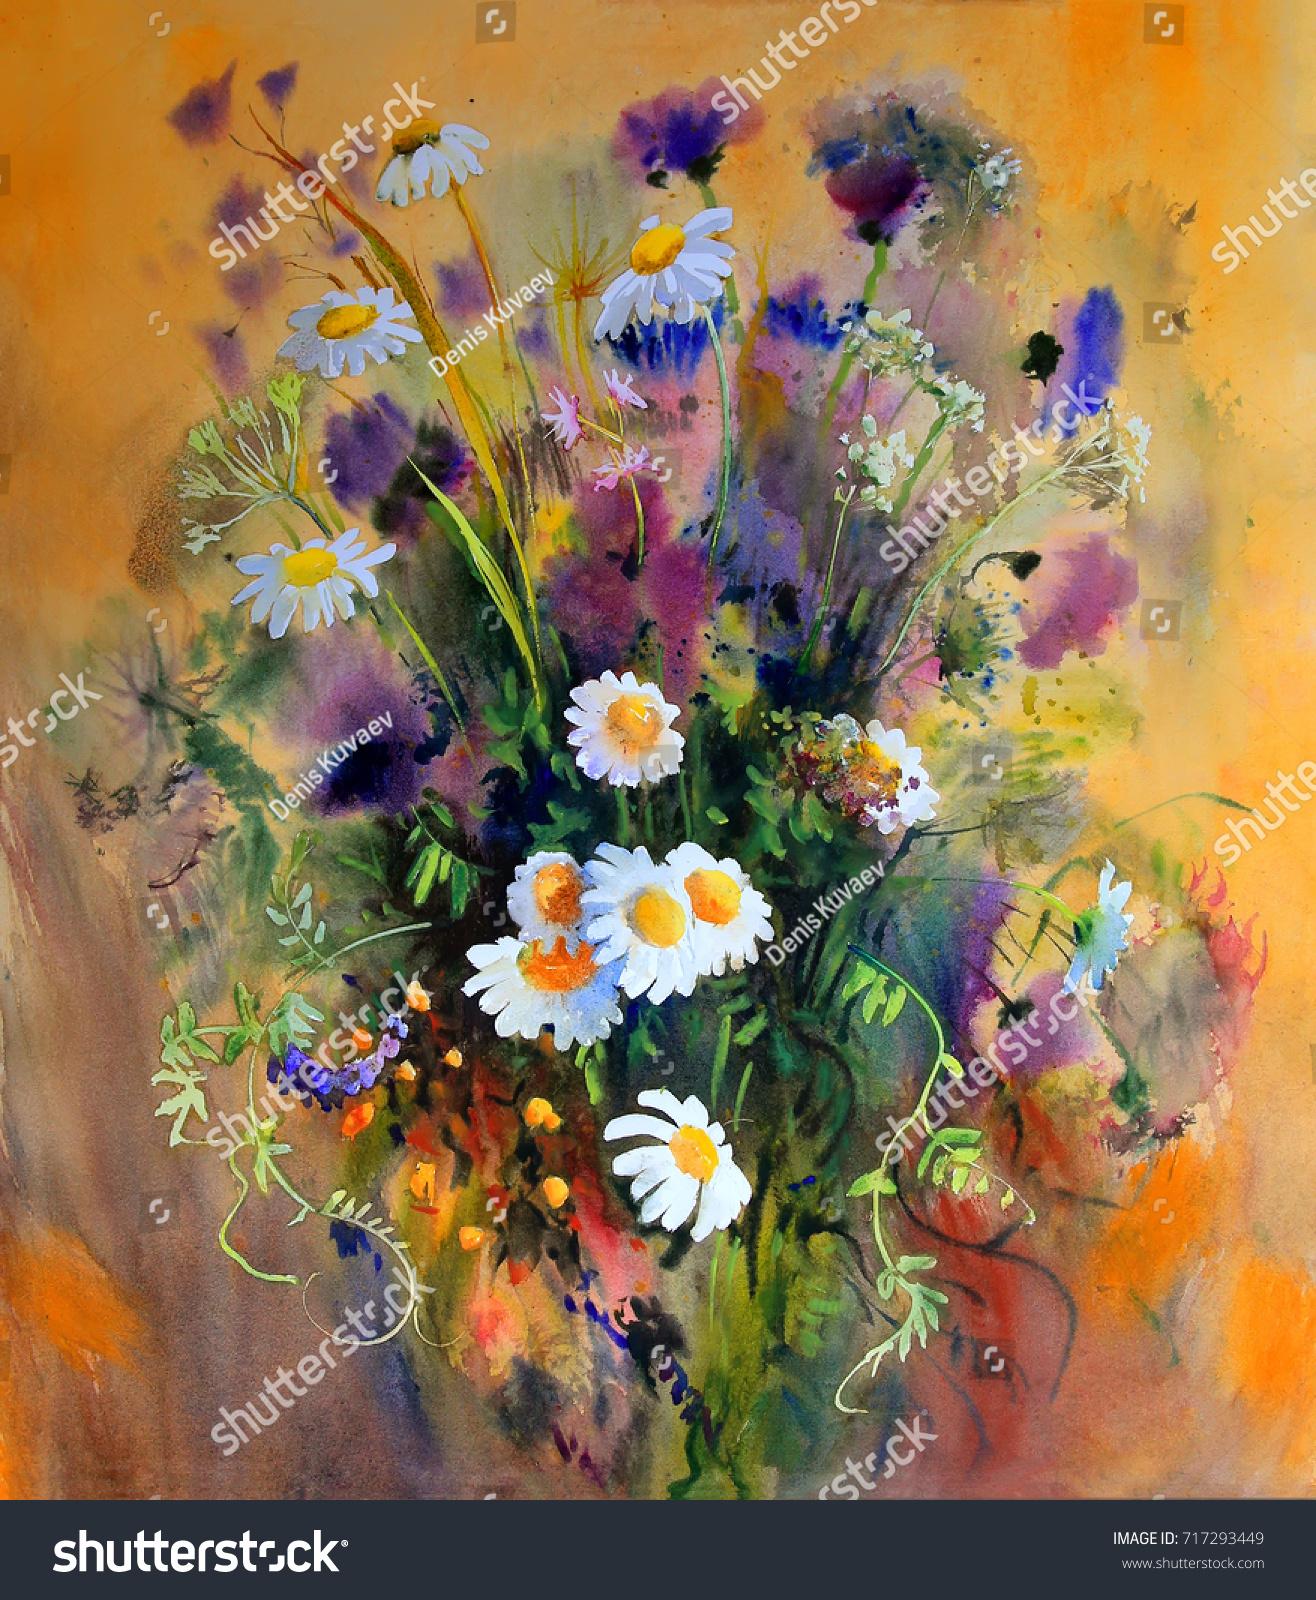 Watercolor Painting Beautiful Flowers Stock Illustration 717293449